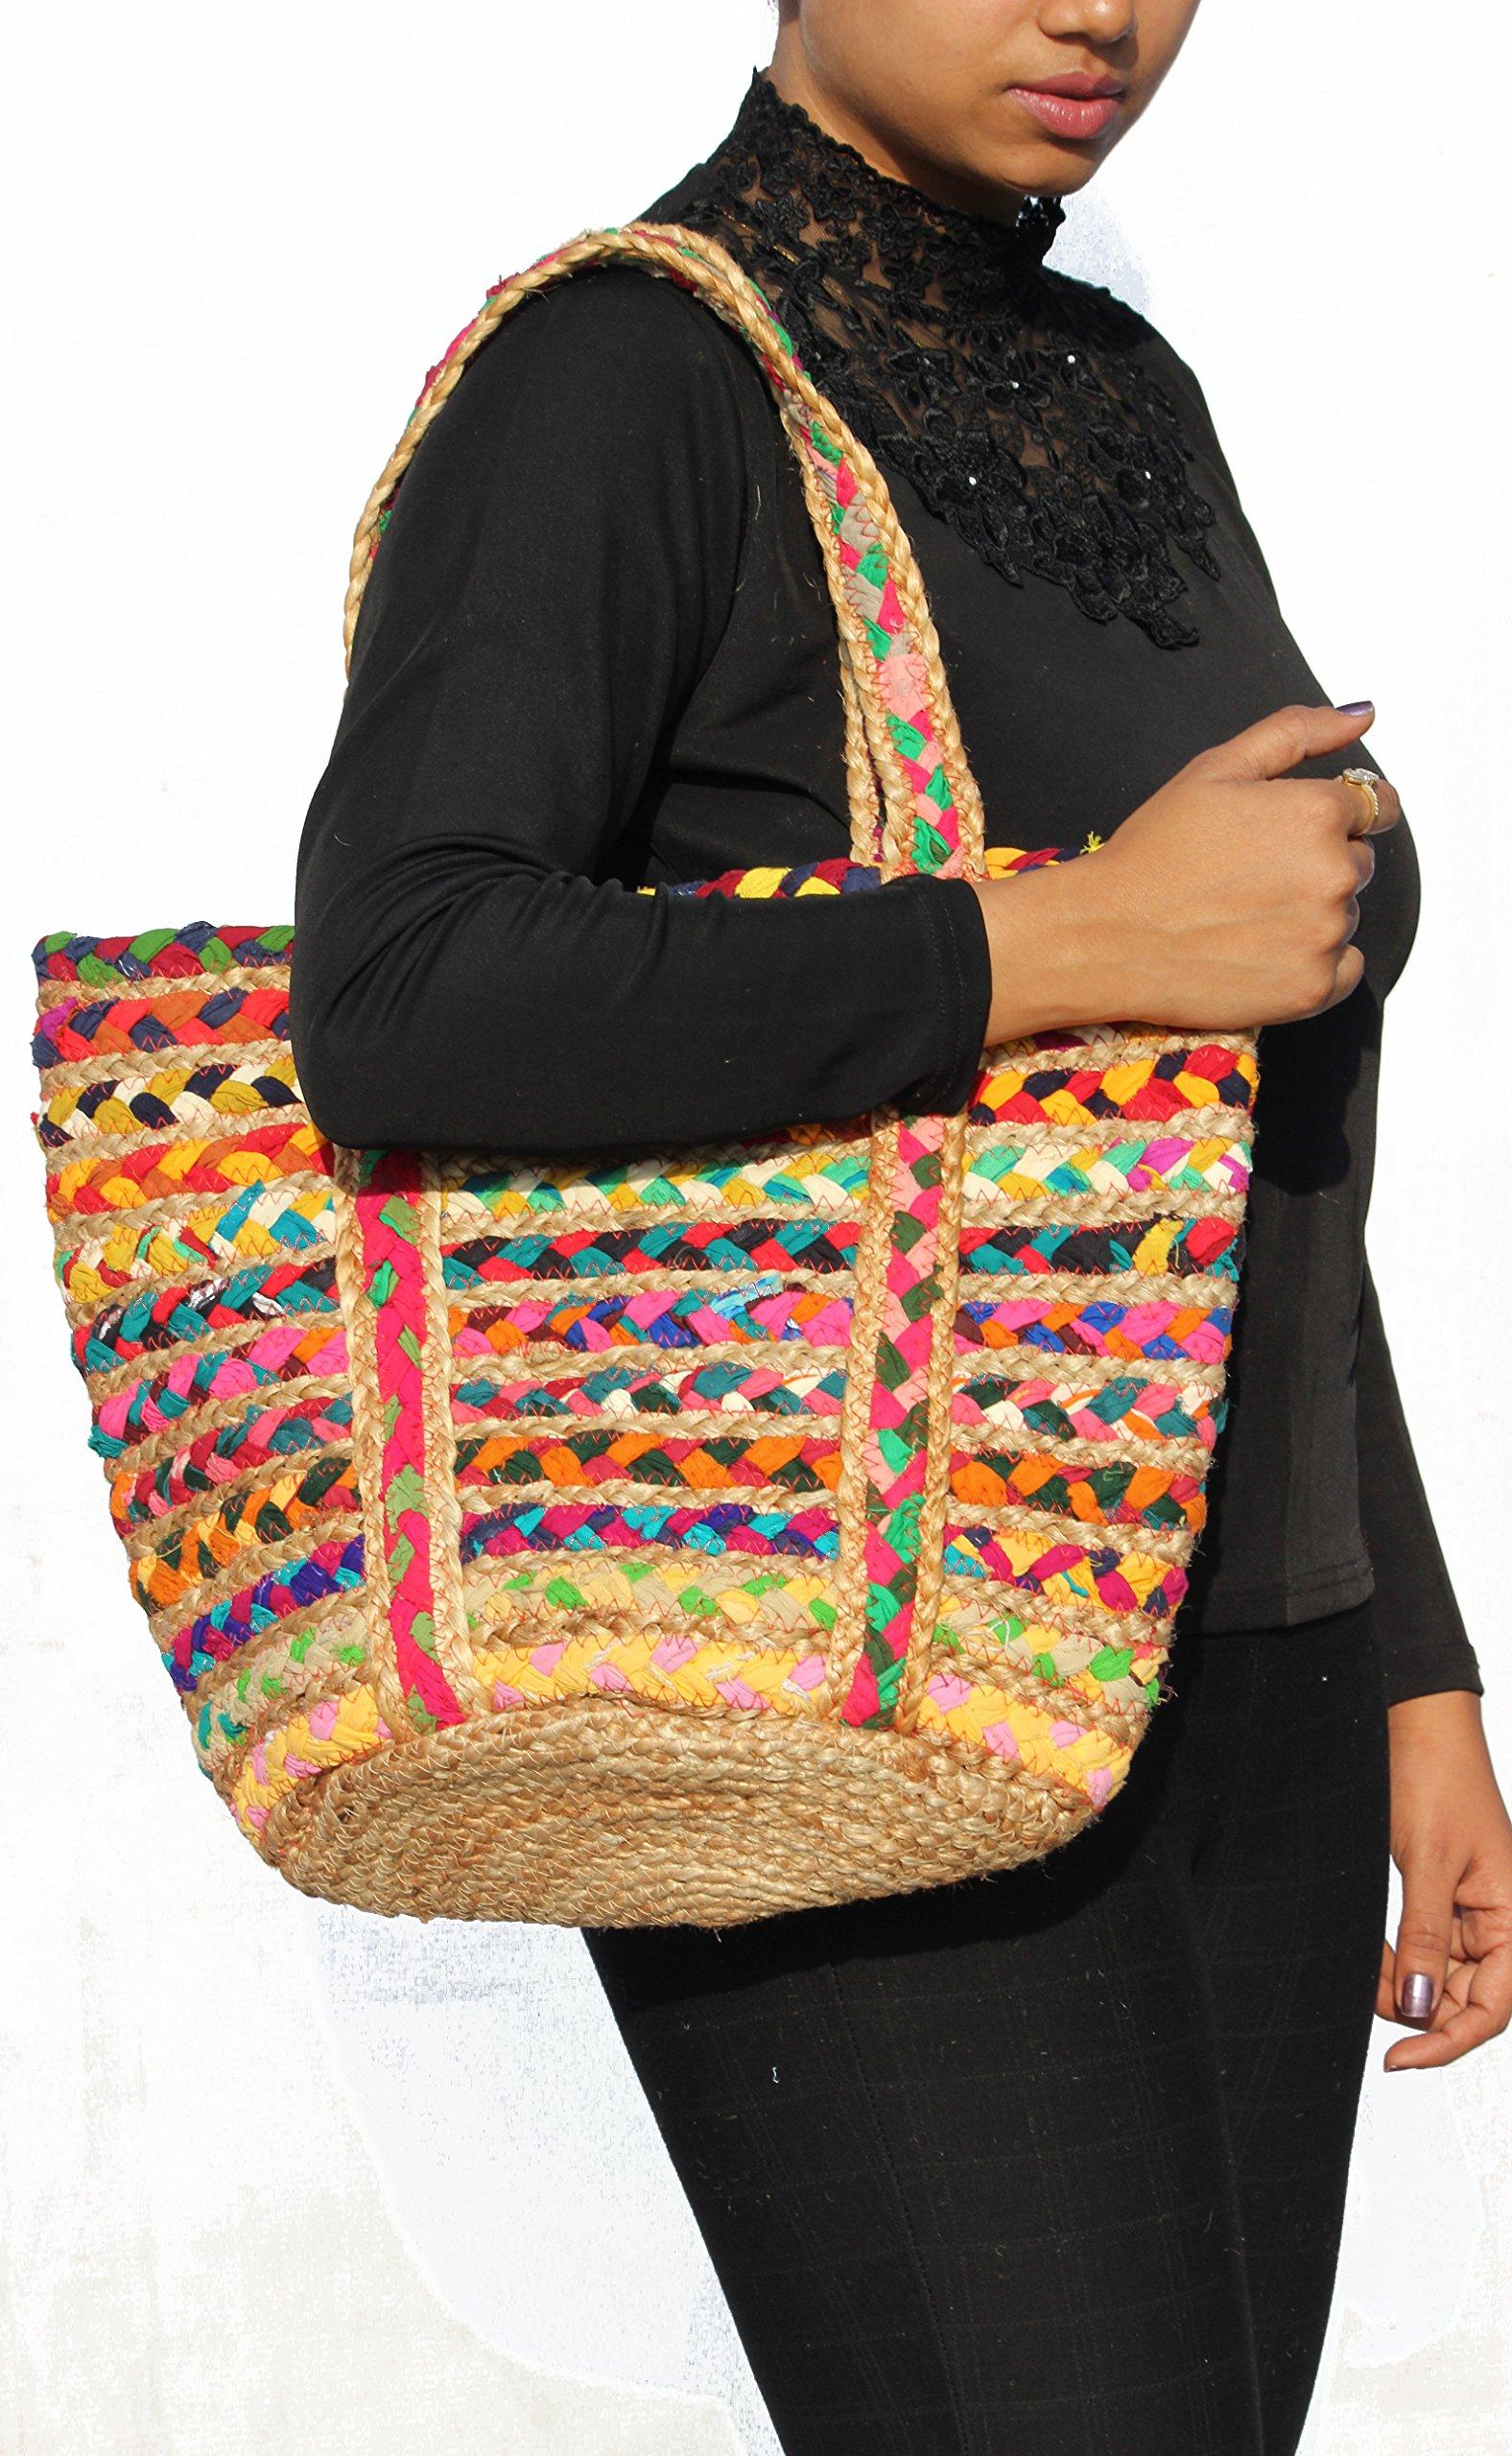 ffe1b315a04d9a TRIBESMANGOLD--Boho Crossbody Shoulder Hemp Tote Bag Bohemian Shopping  Beach Leisure Handbag Tribal Pattern